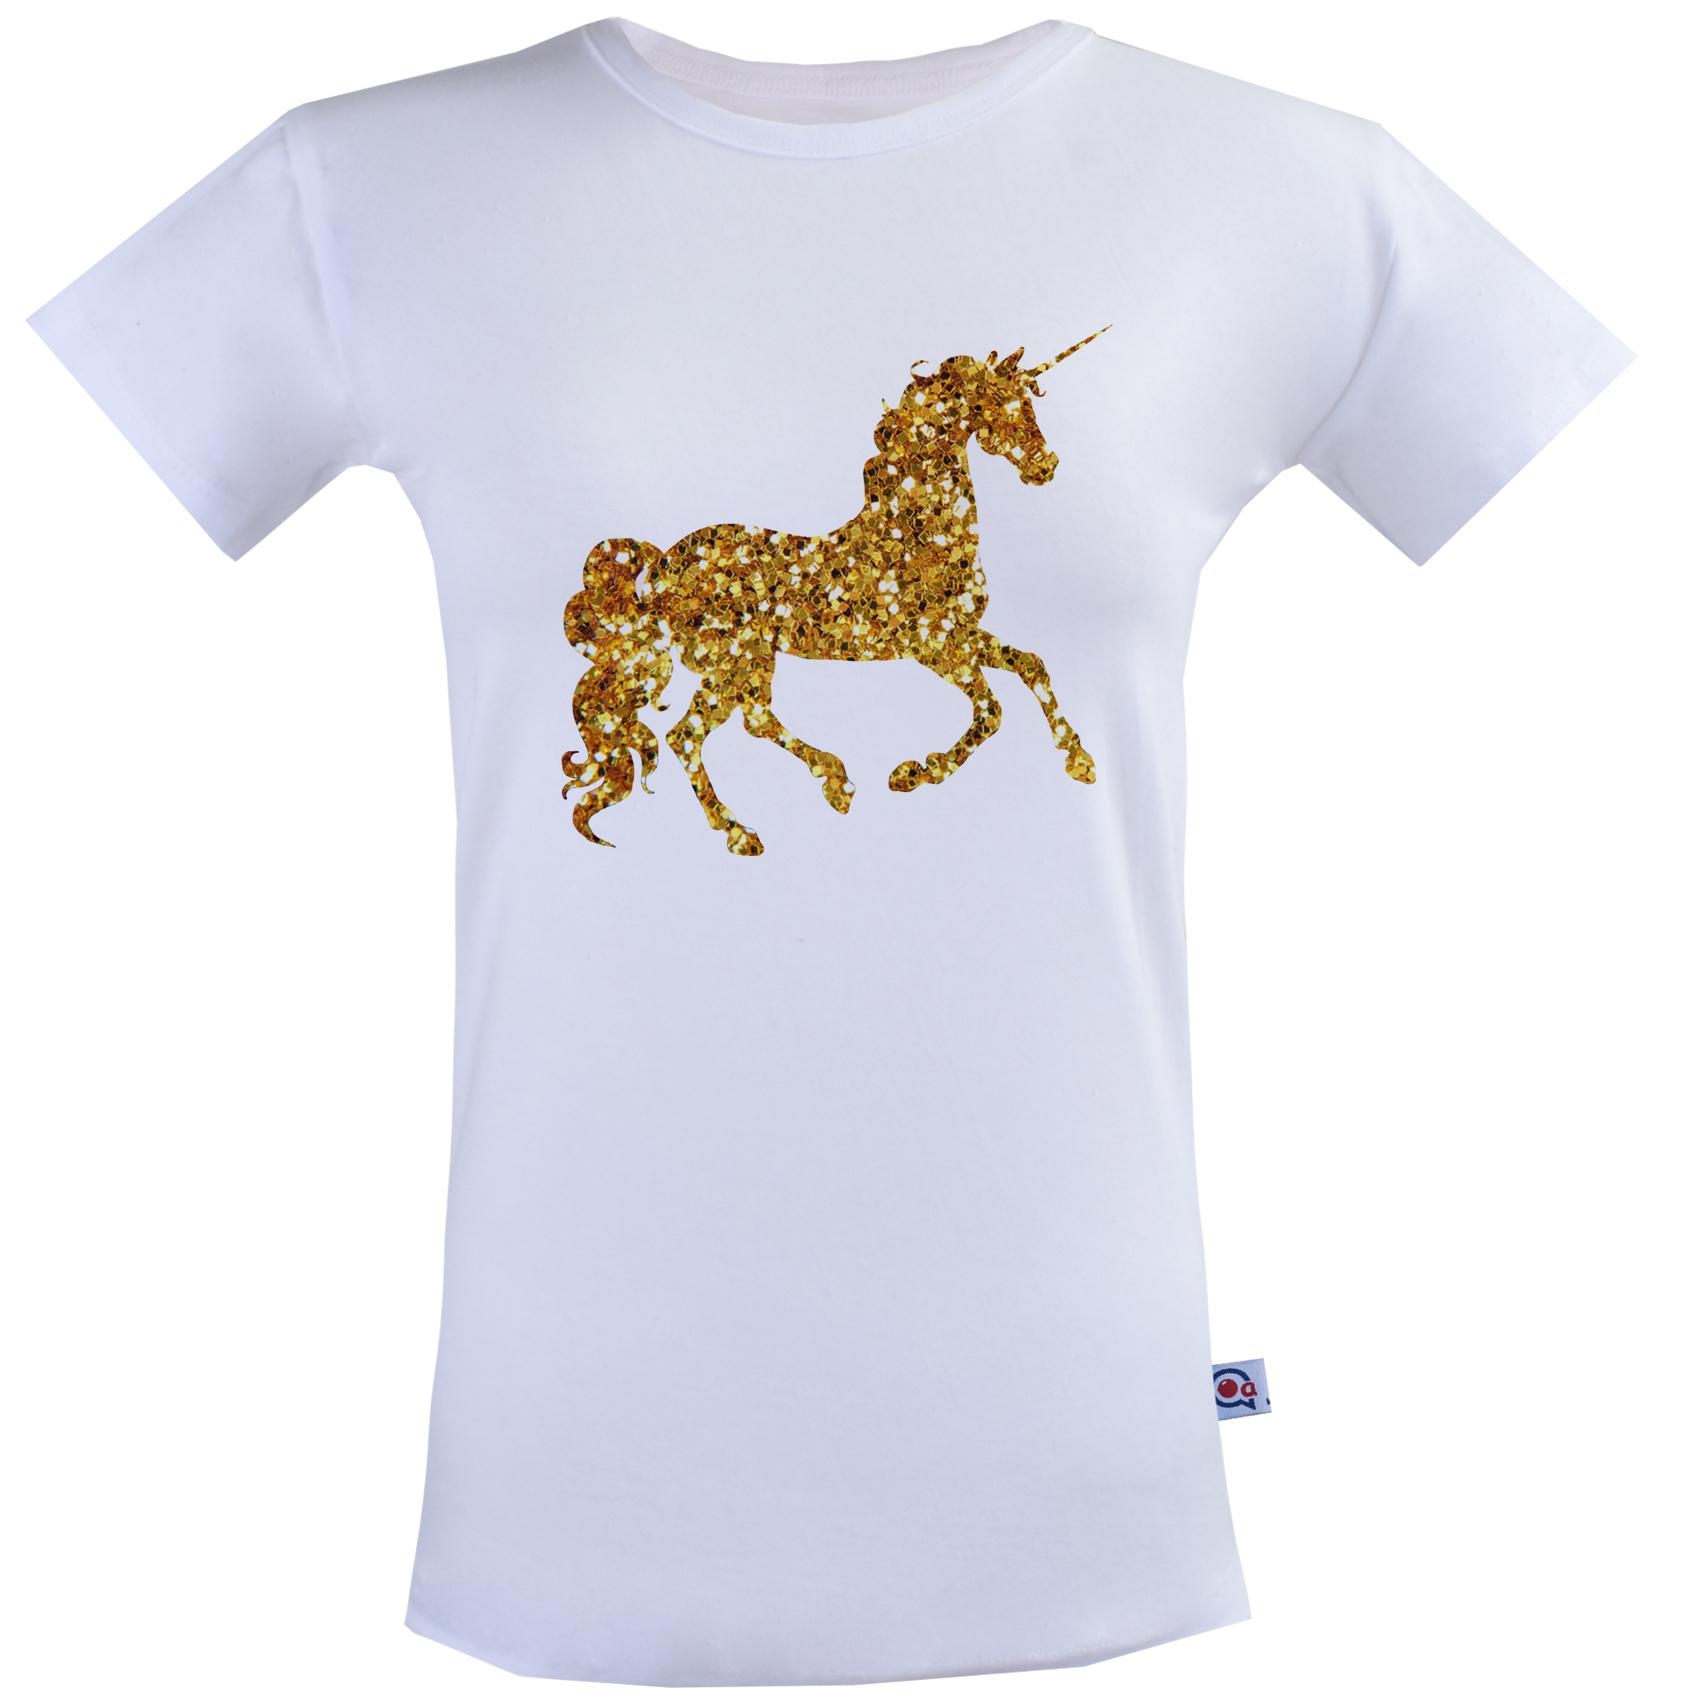 تیشرت زنانه آستین کوتاه آکو طرح اسب طلایی کد BS37